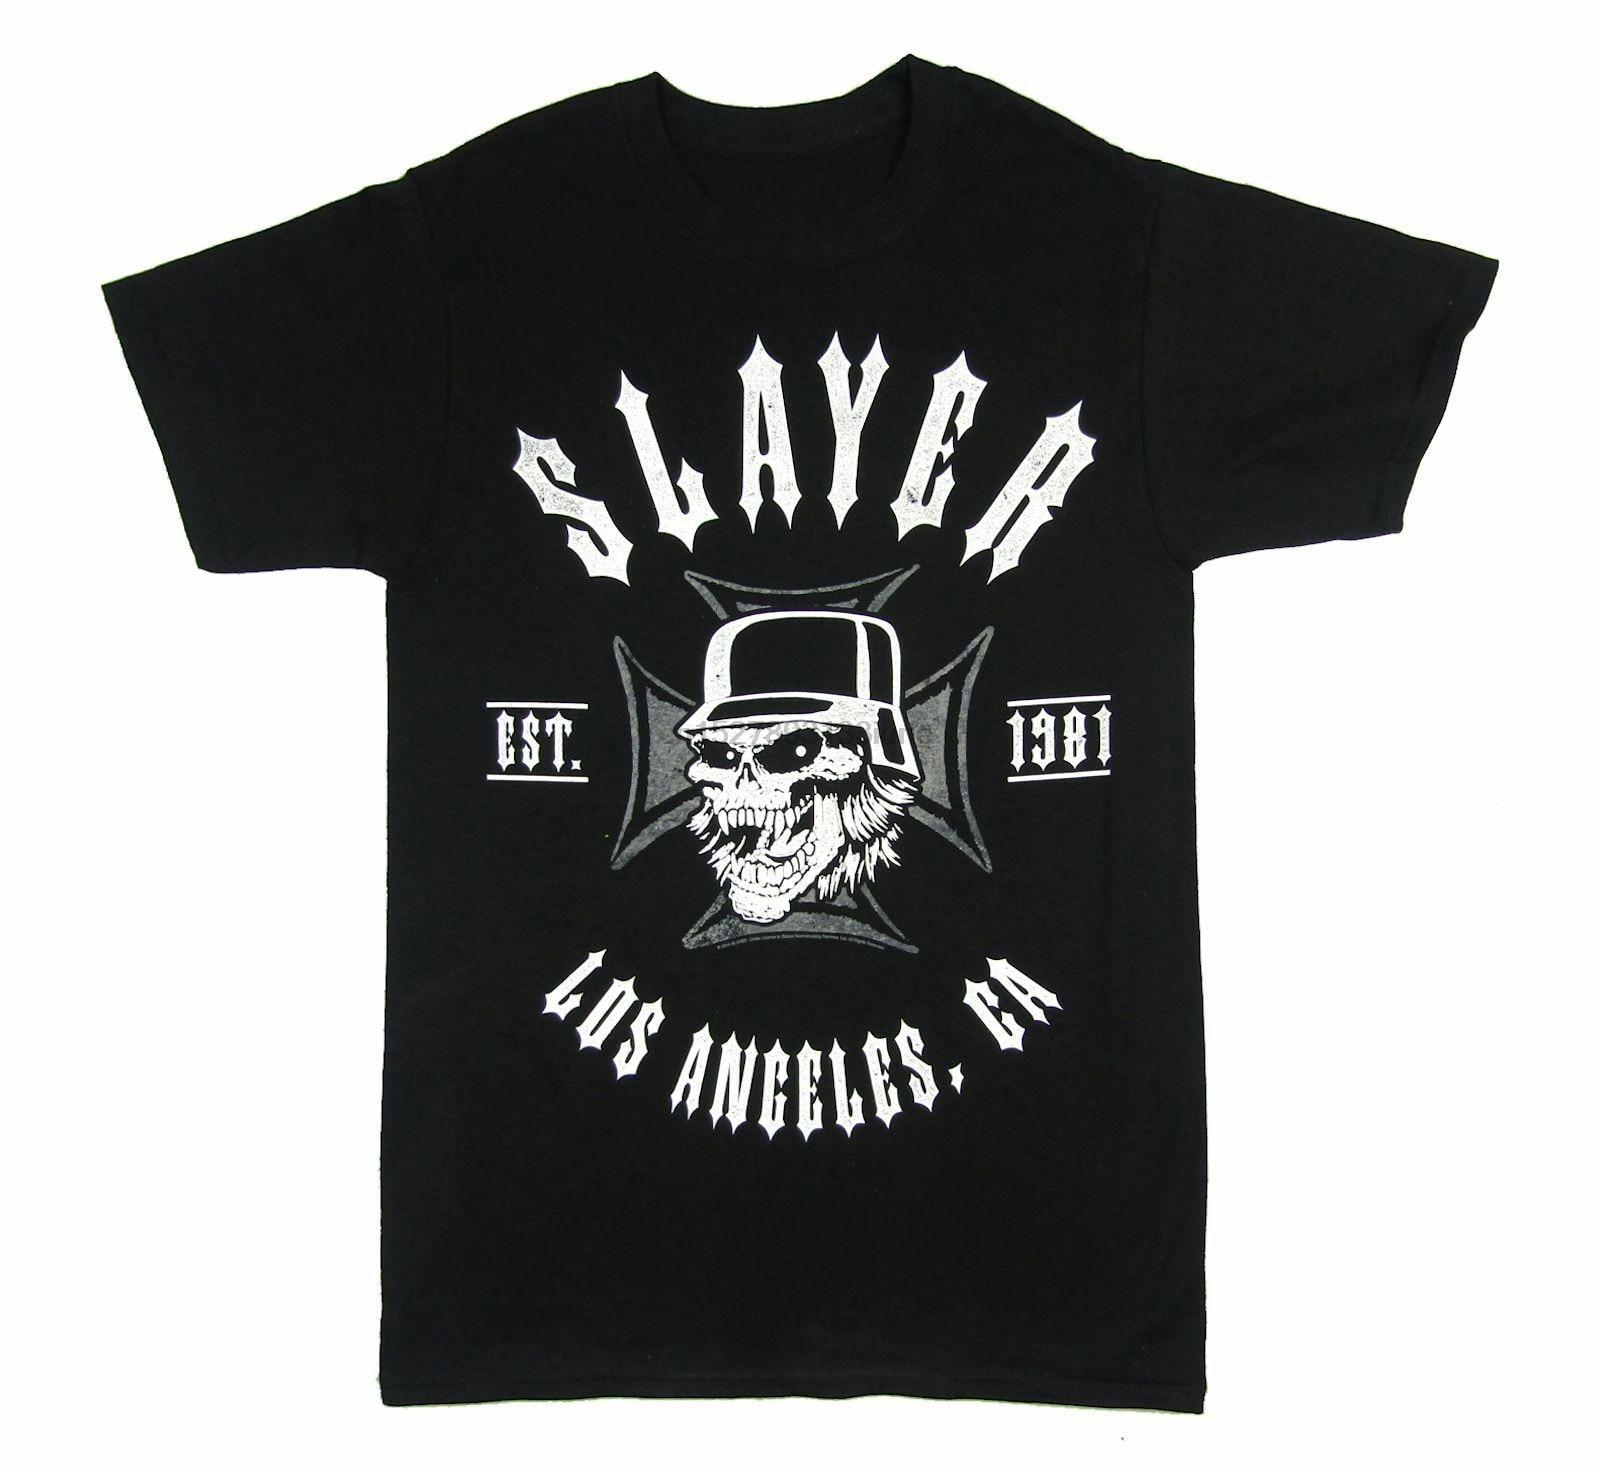 Cazadora Cruz 81 Est Camiseta negra calavera 1981 nueva banda oficial Merch...